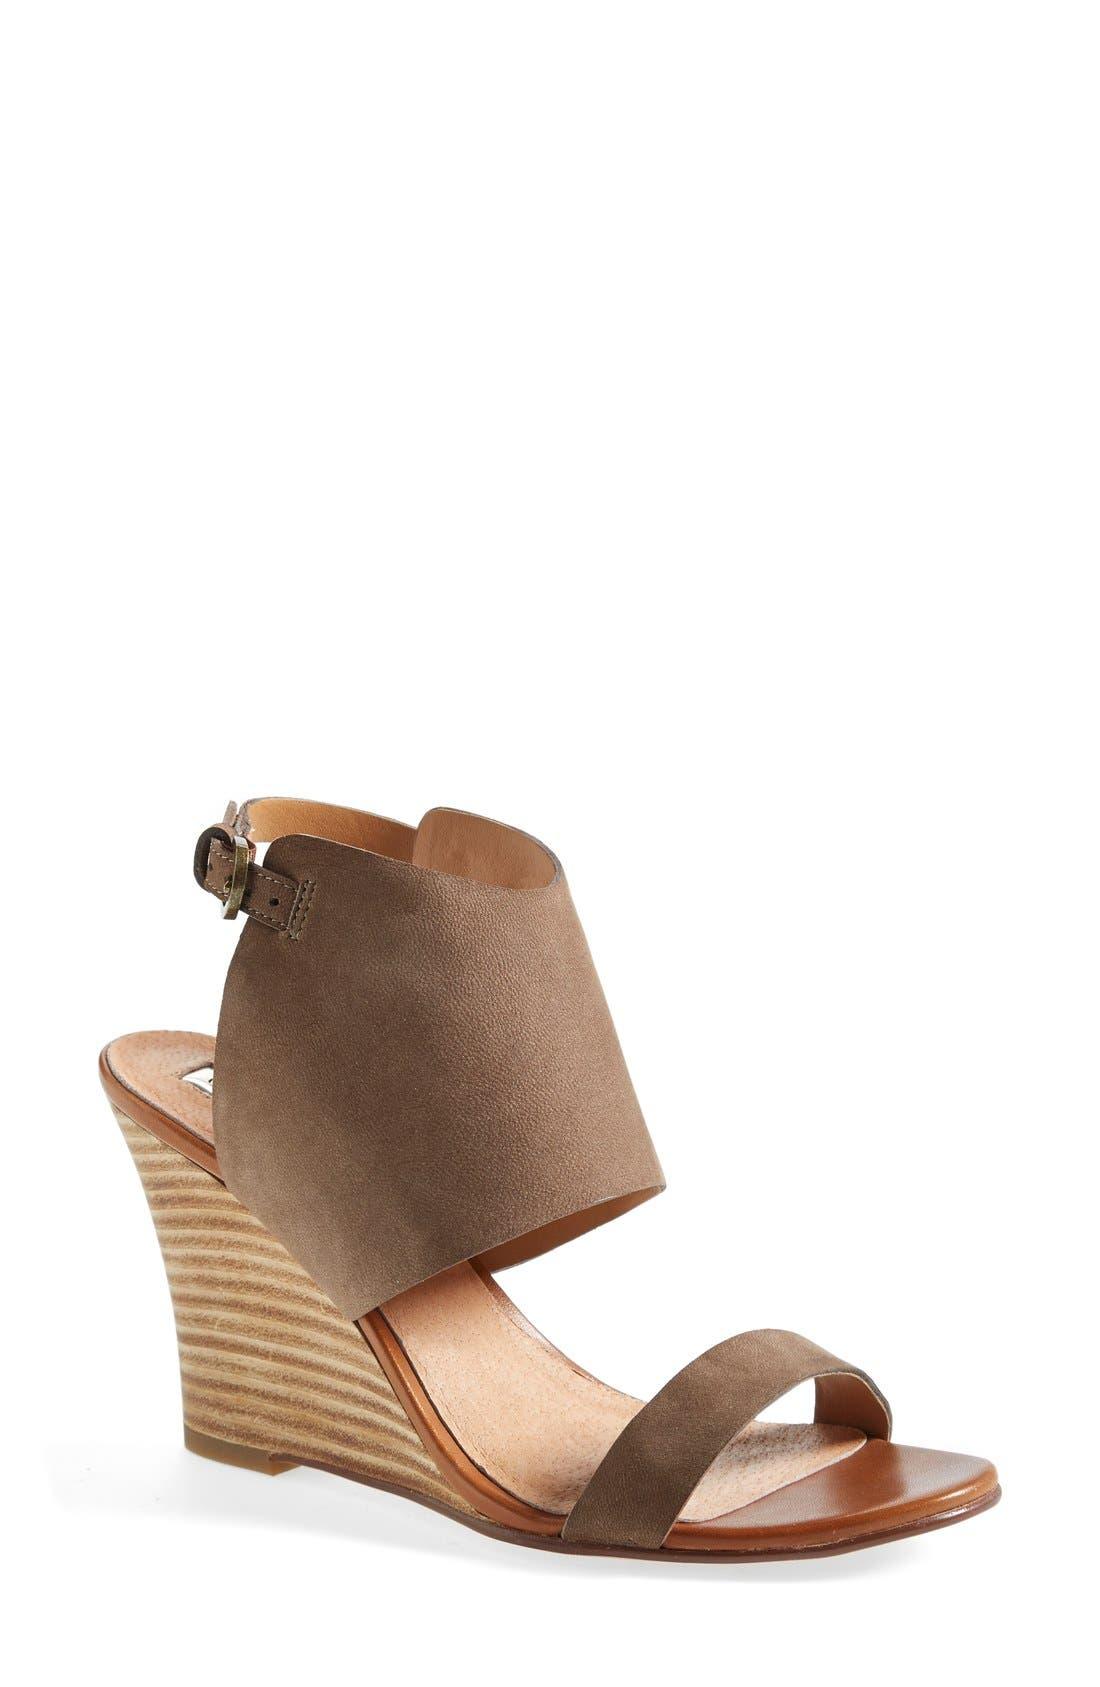 Alternate Image 1 Selected - Halogen® 'Clarette' Wedge Sandal (Women)